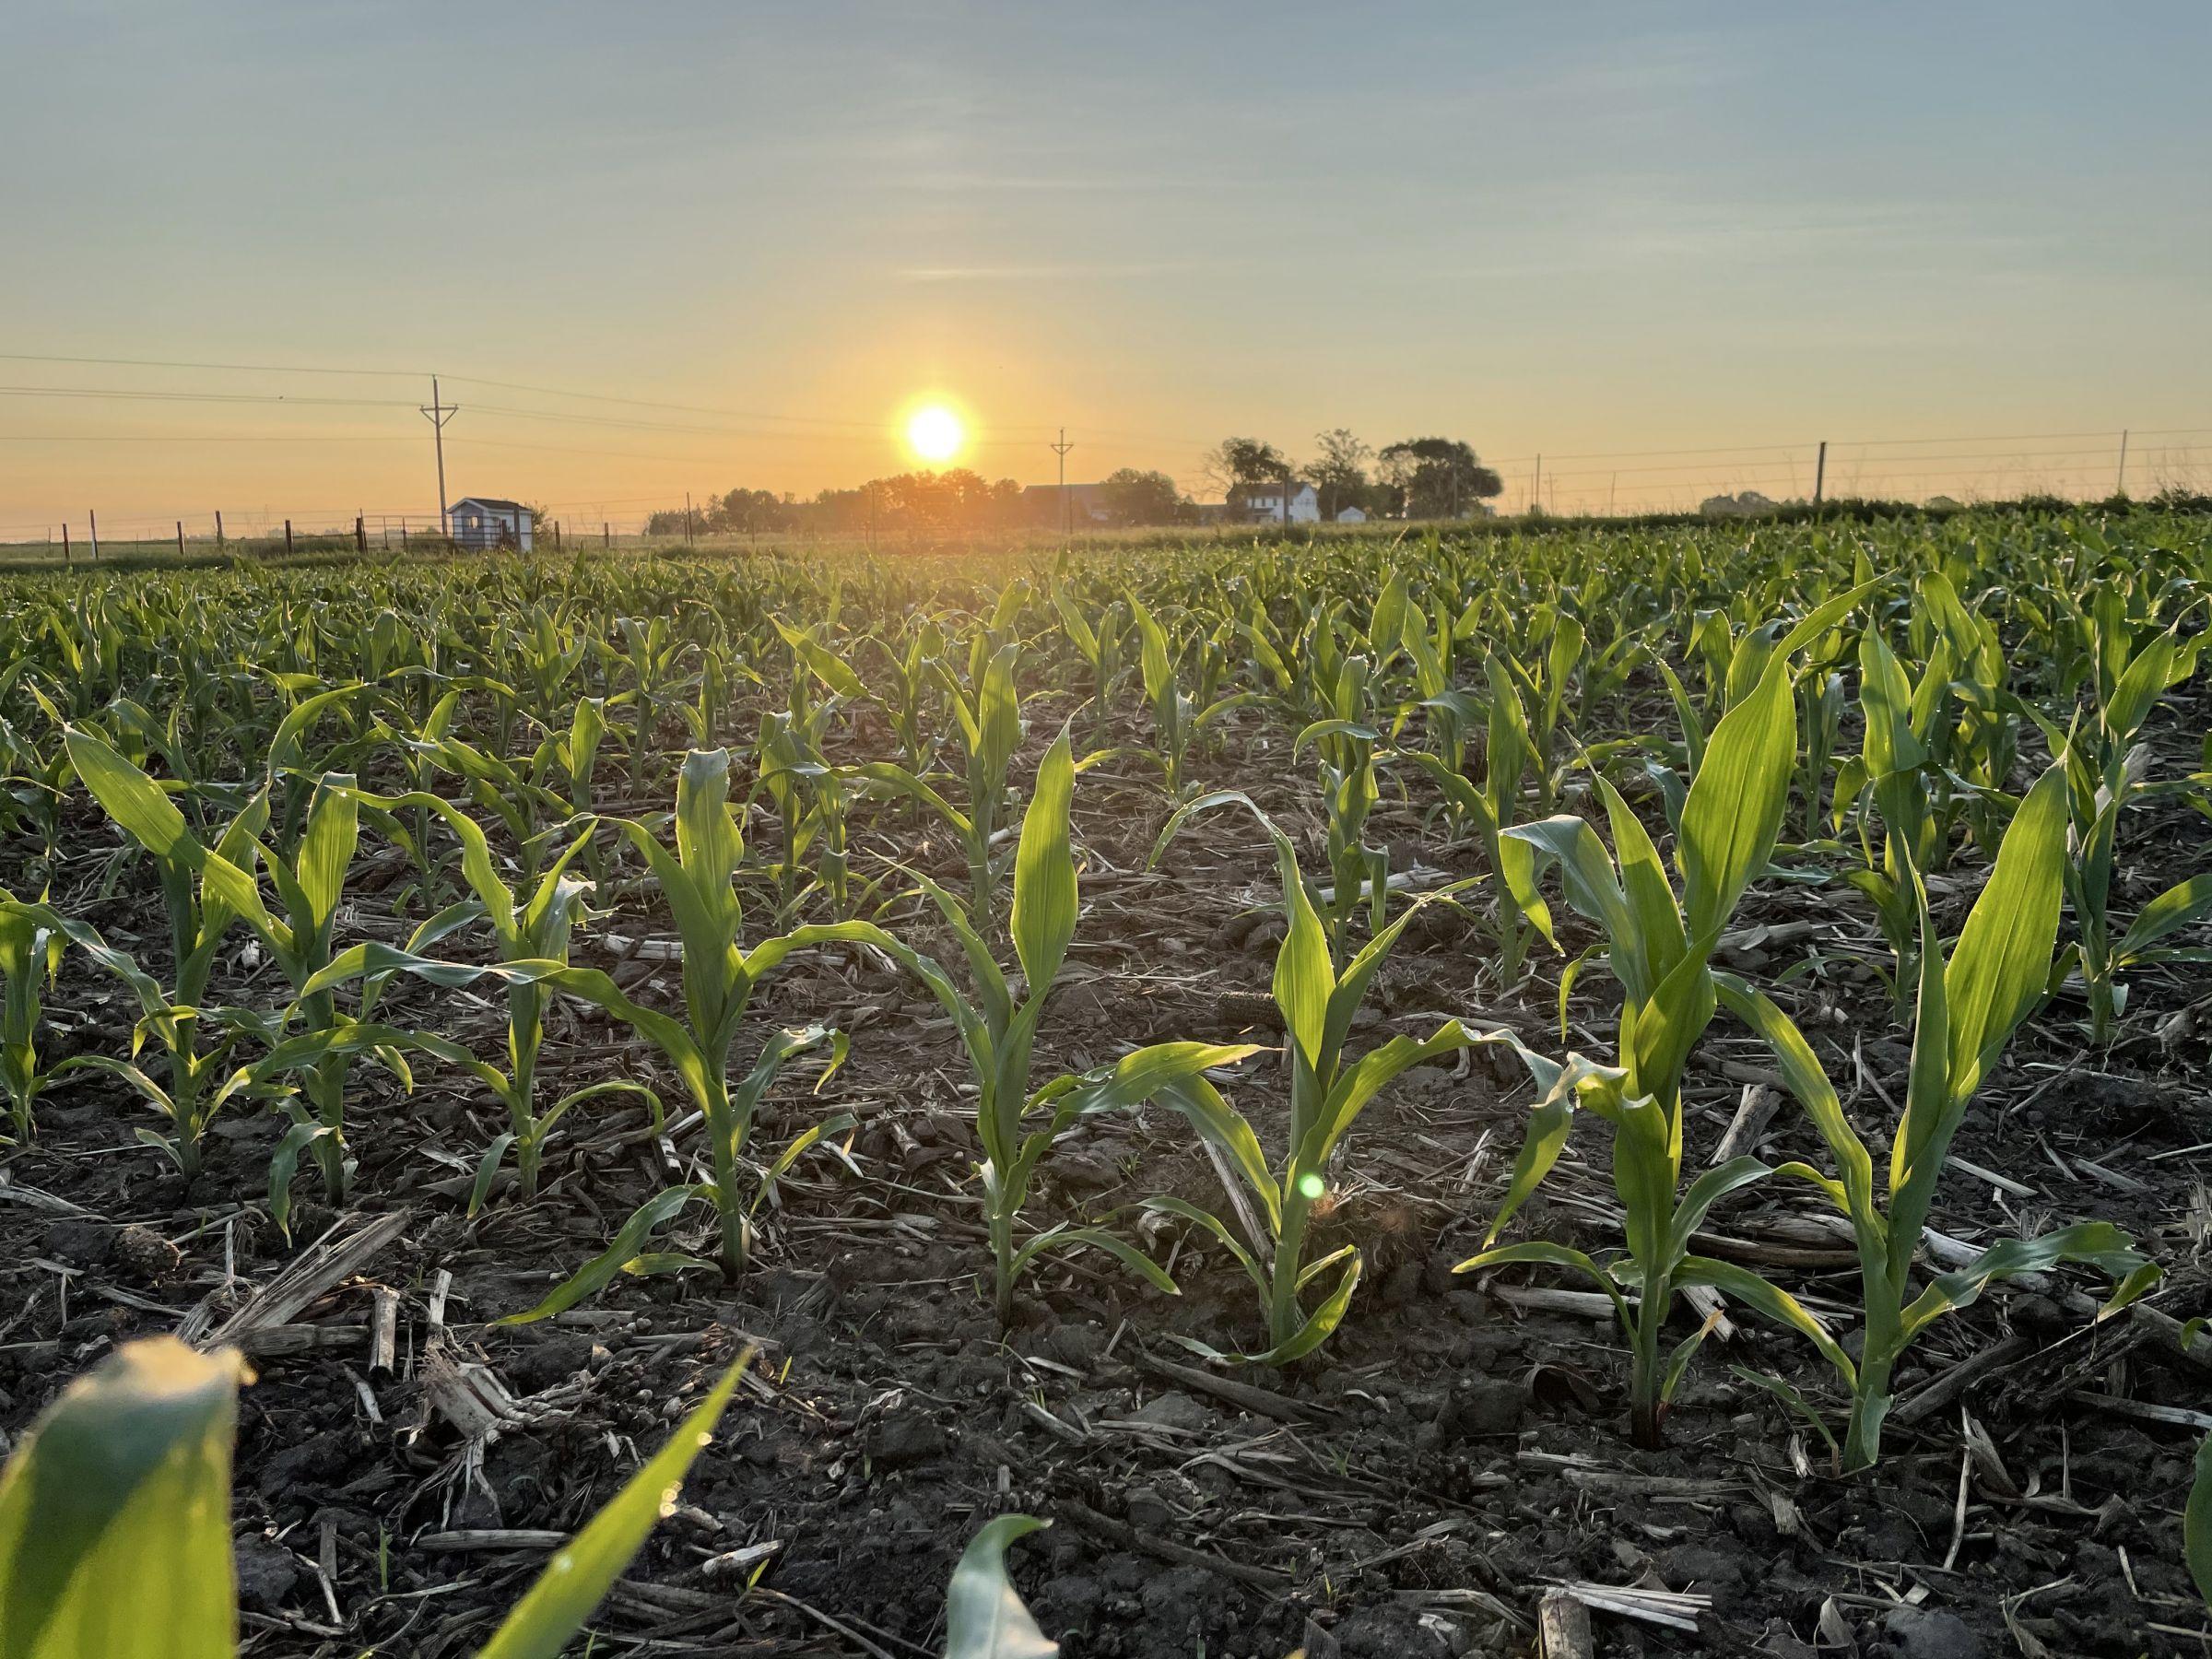 land-buchanan-county-iowa-68-acres-listing-number-15572-3-2021-06-10-145608.JPG